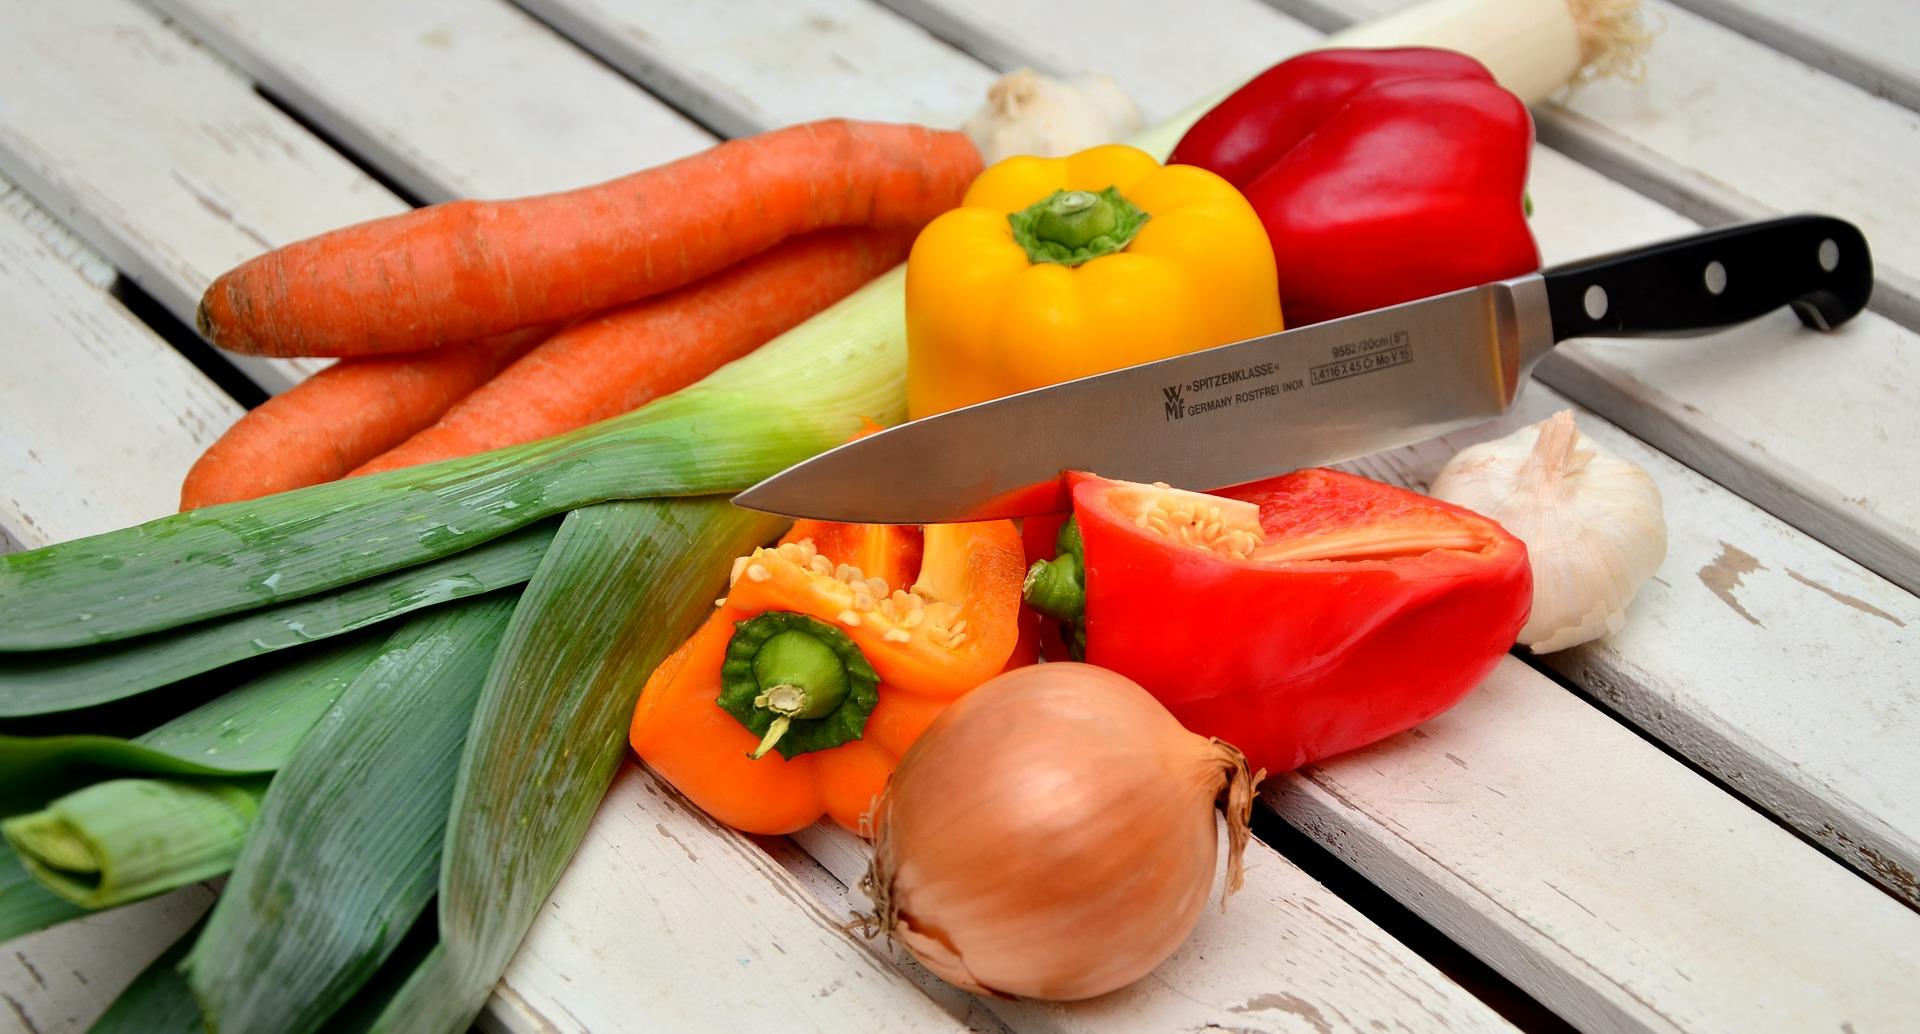 couper-legumes